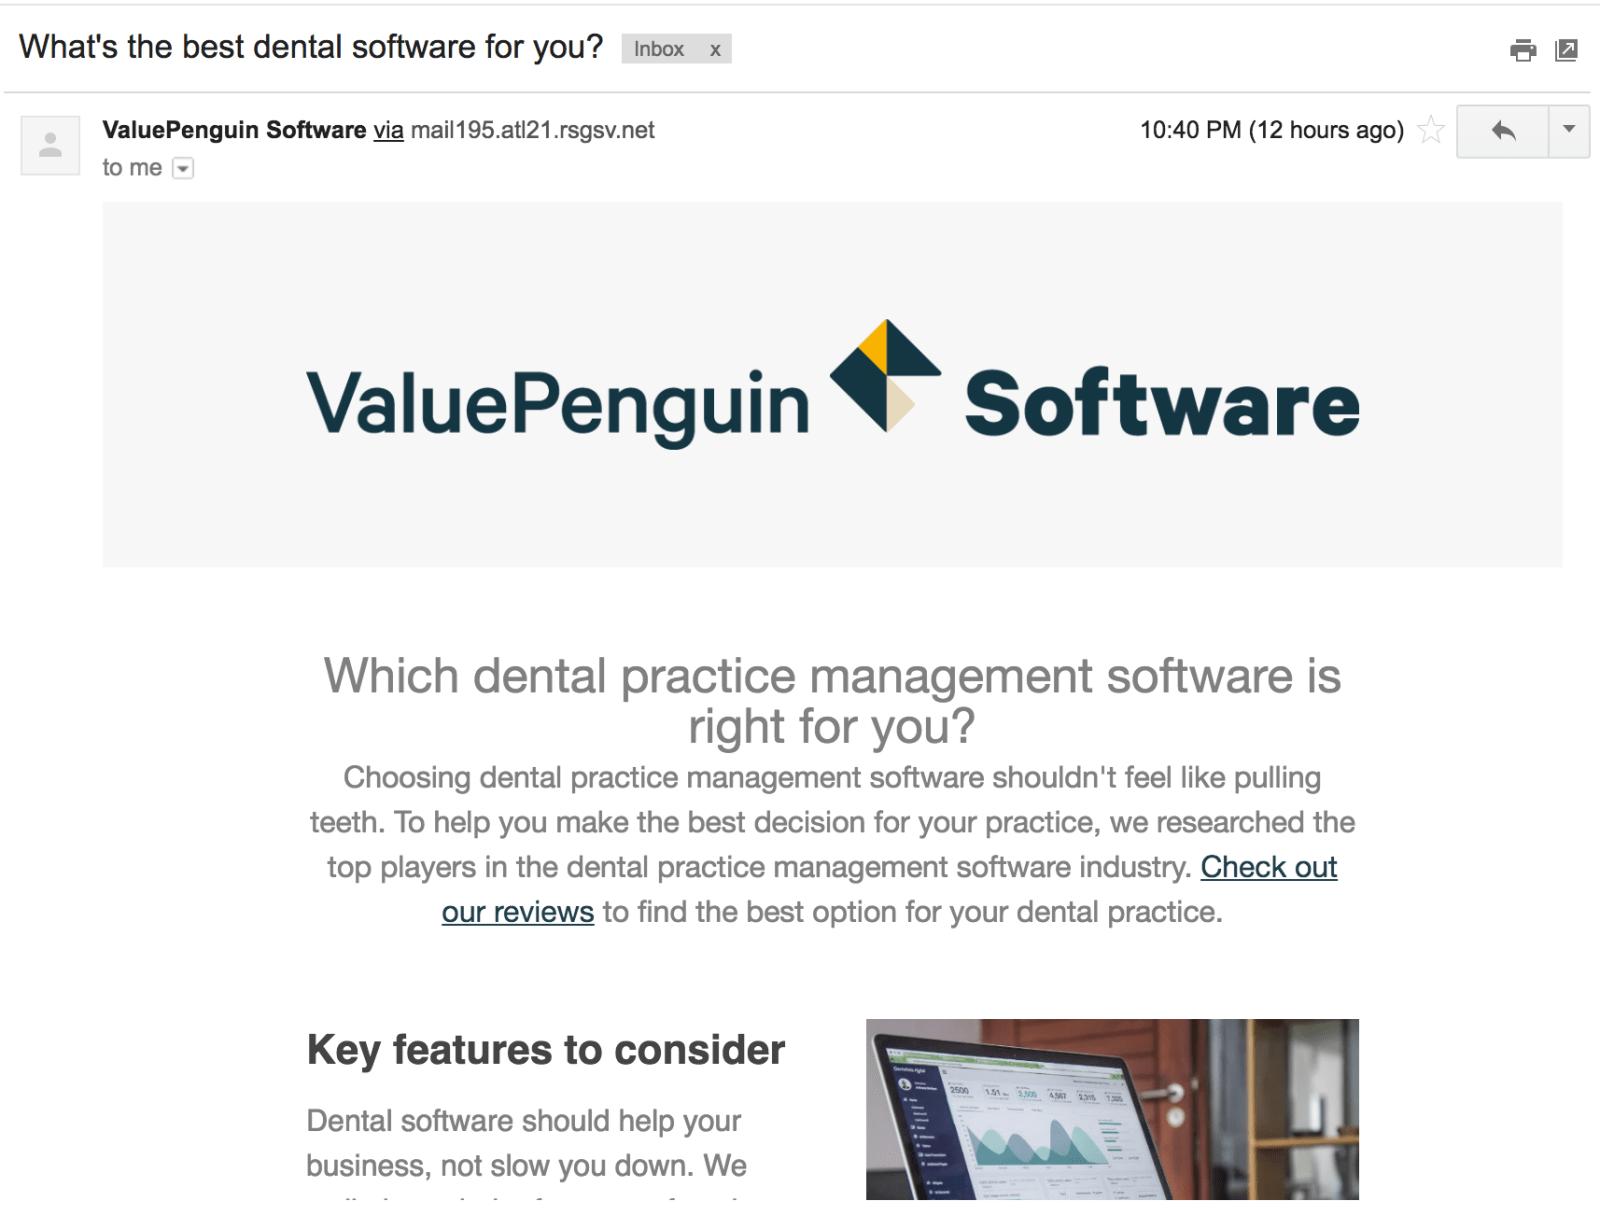 MailChimp Example Newsletter